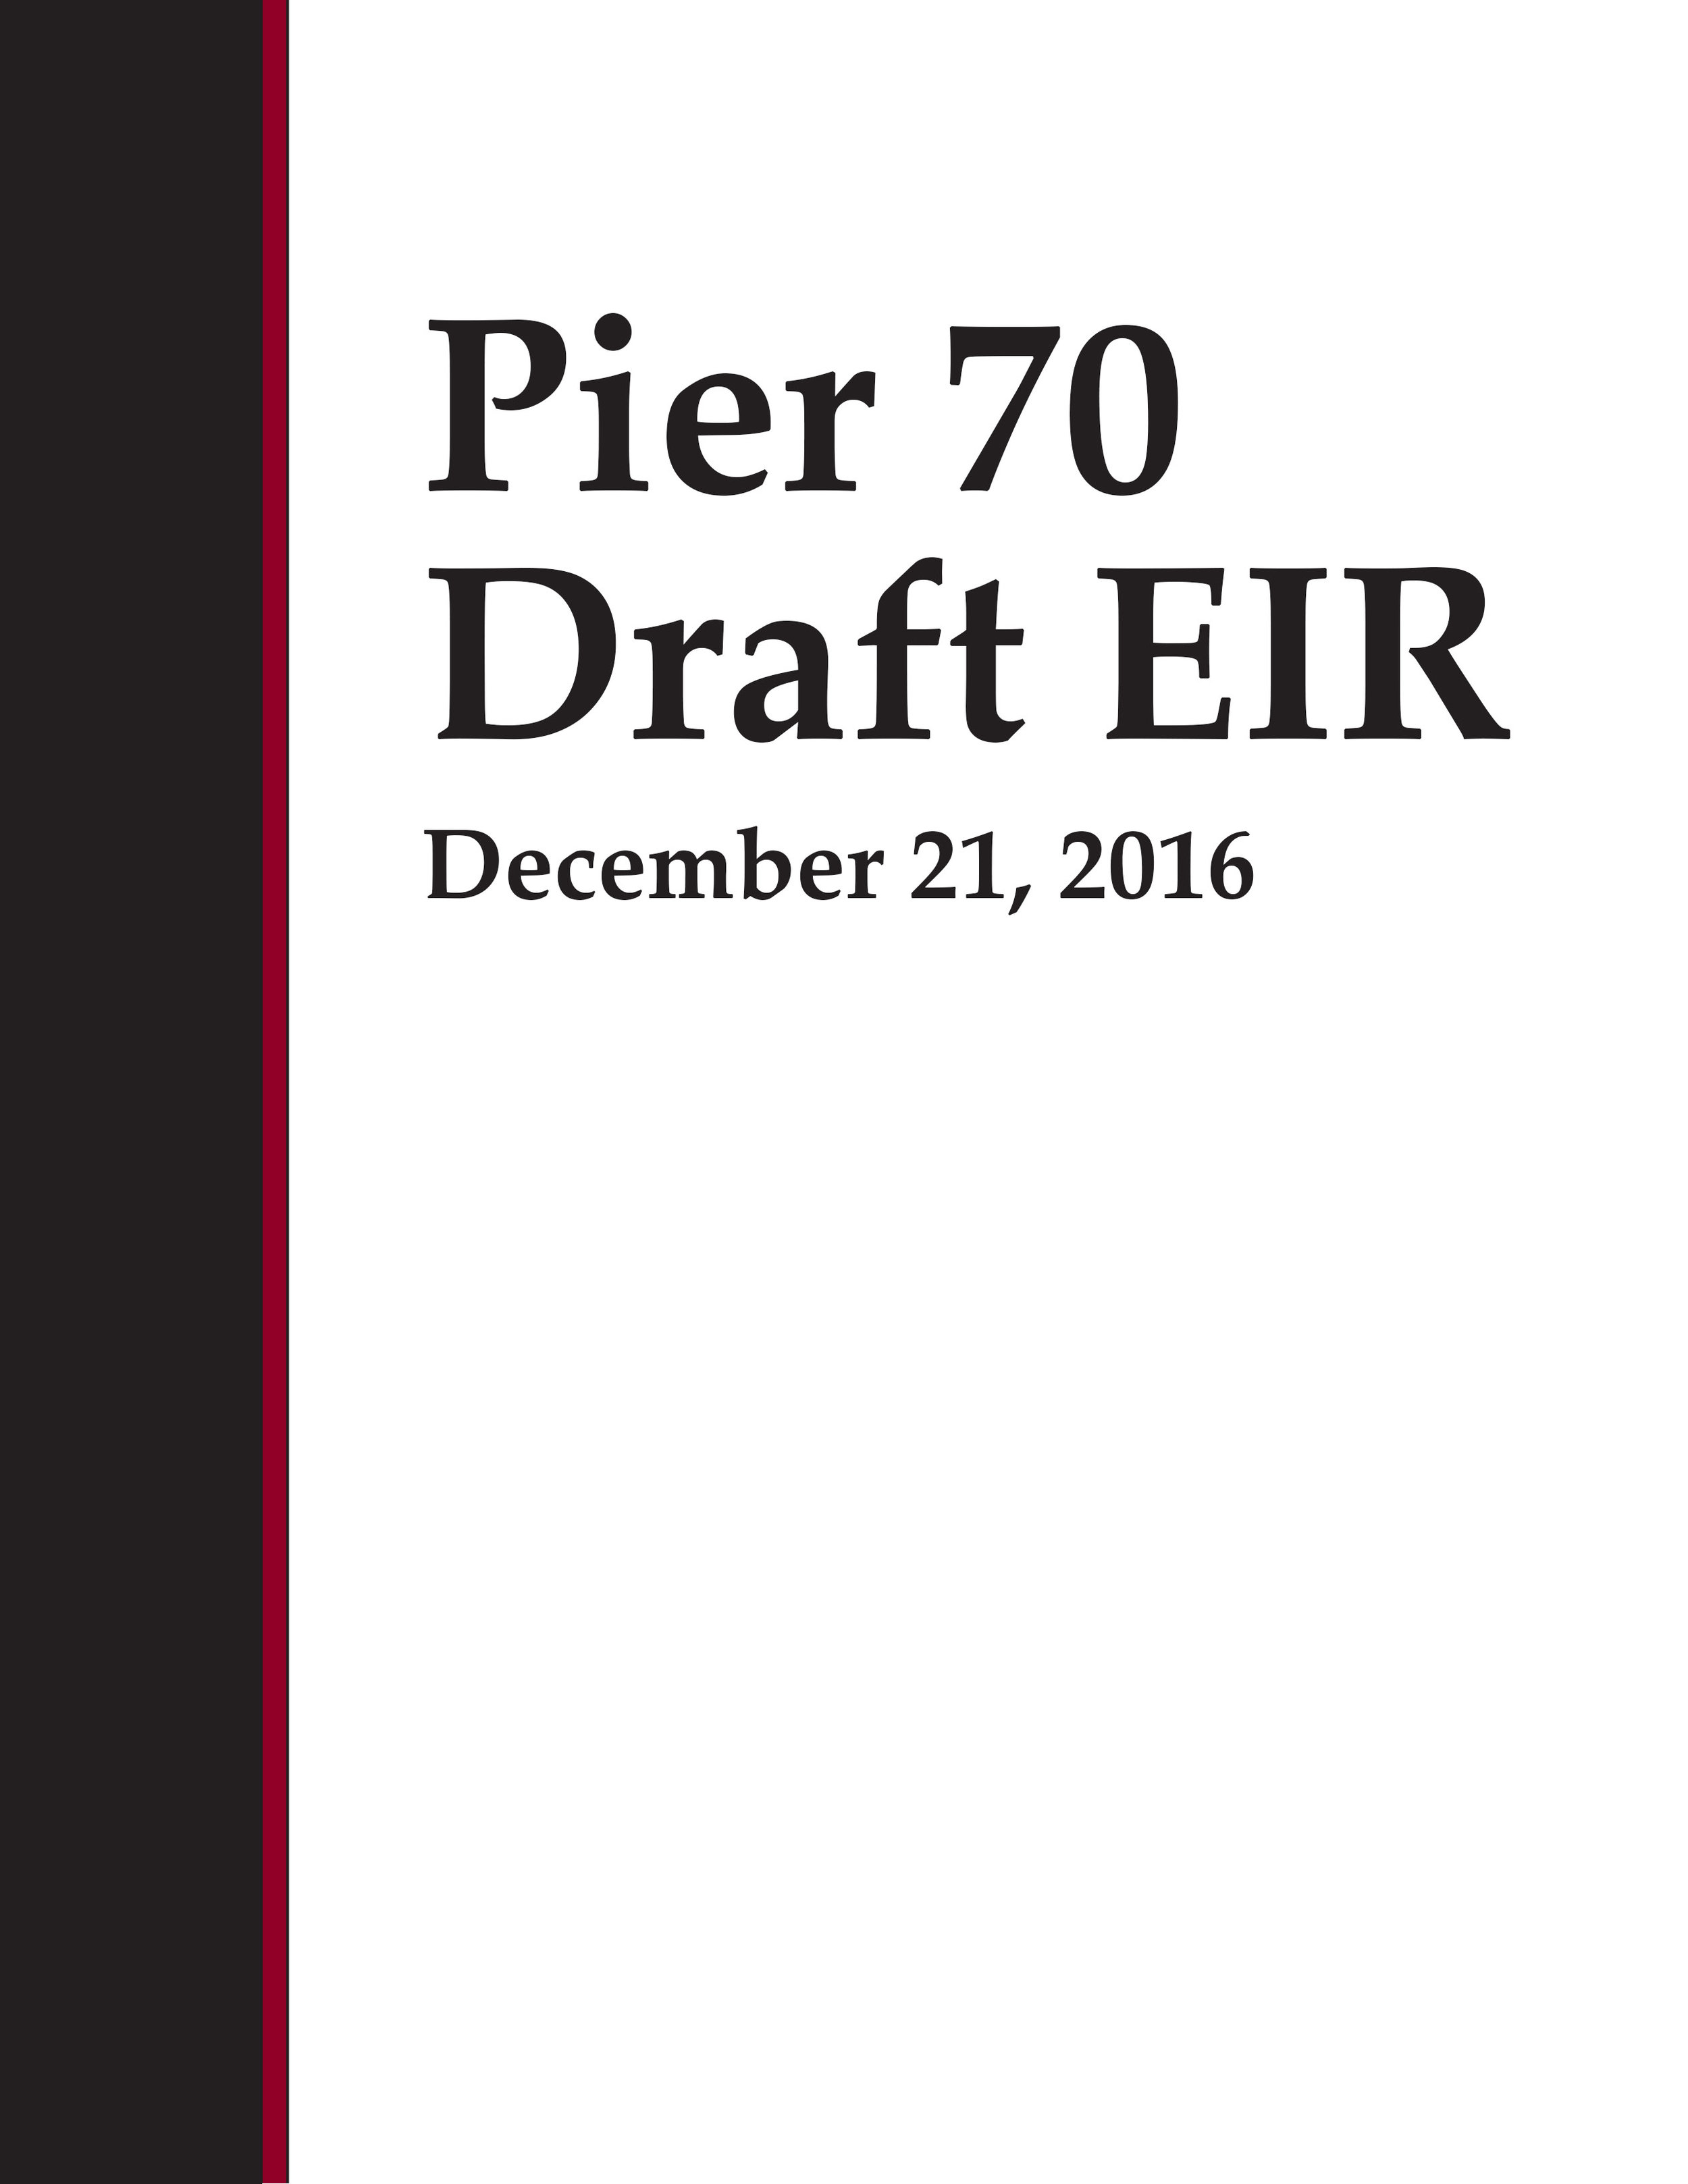 Draft DEIR Cover.jpg